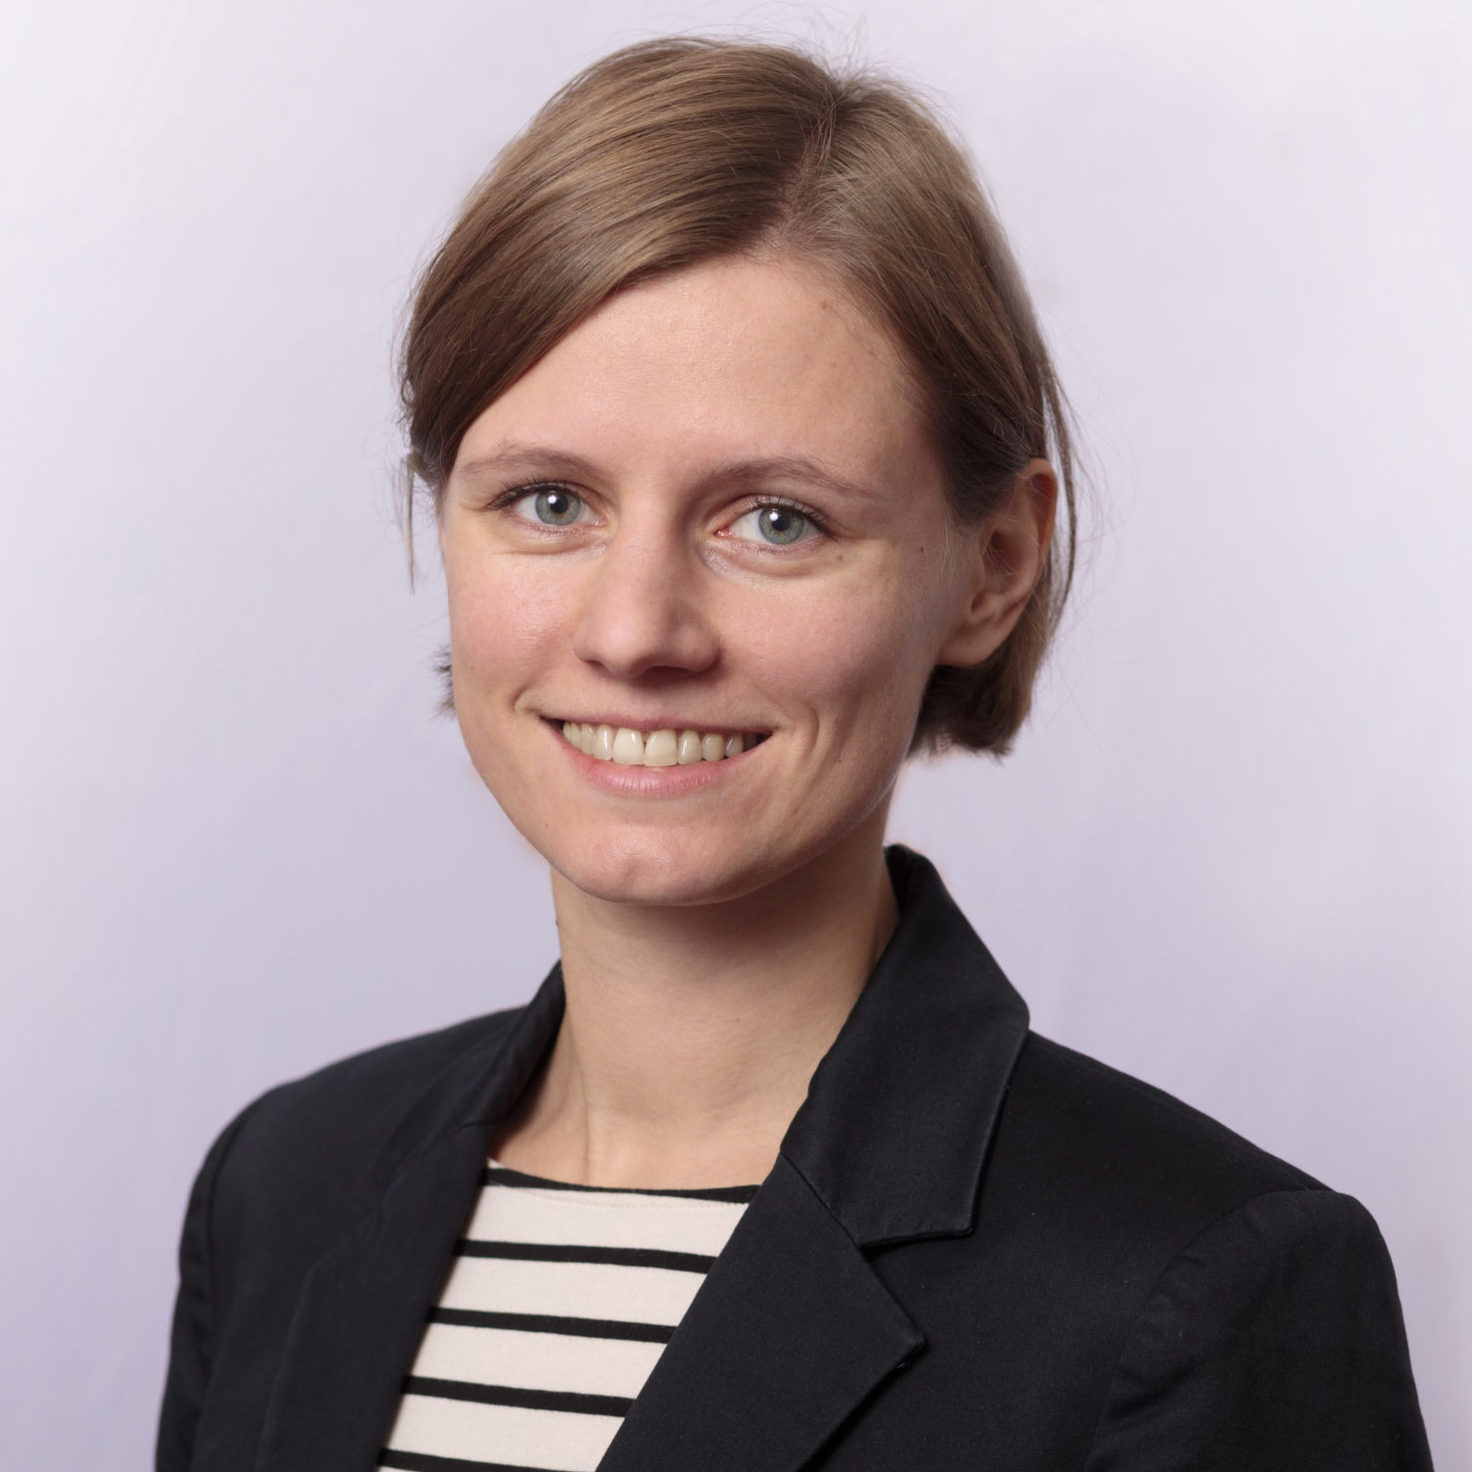 Inga Leffers